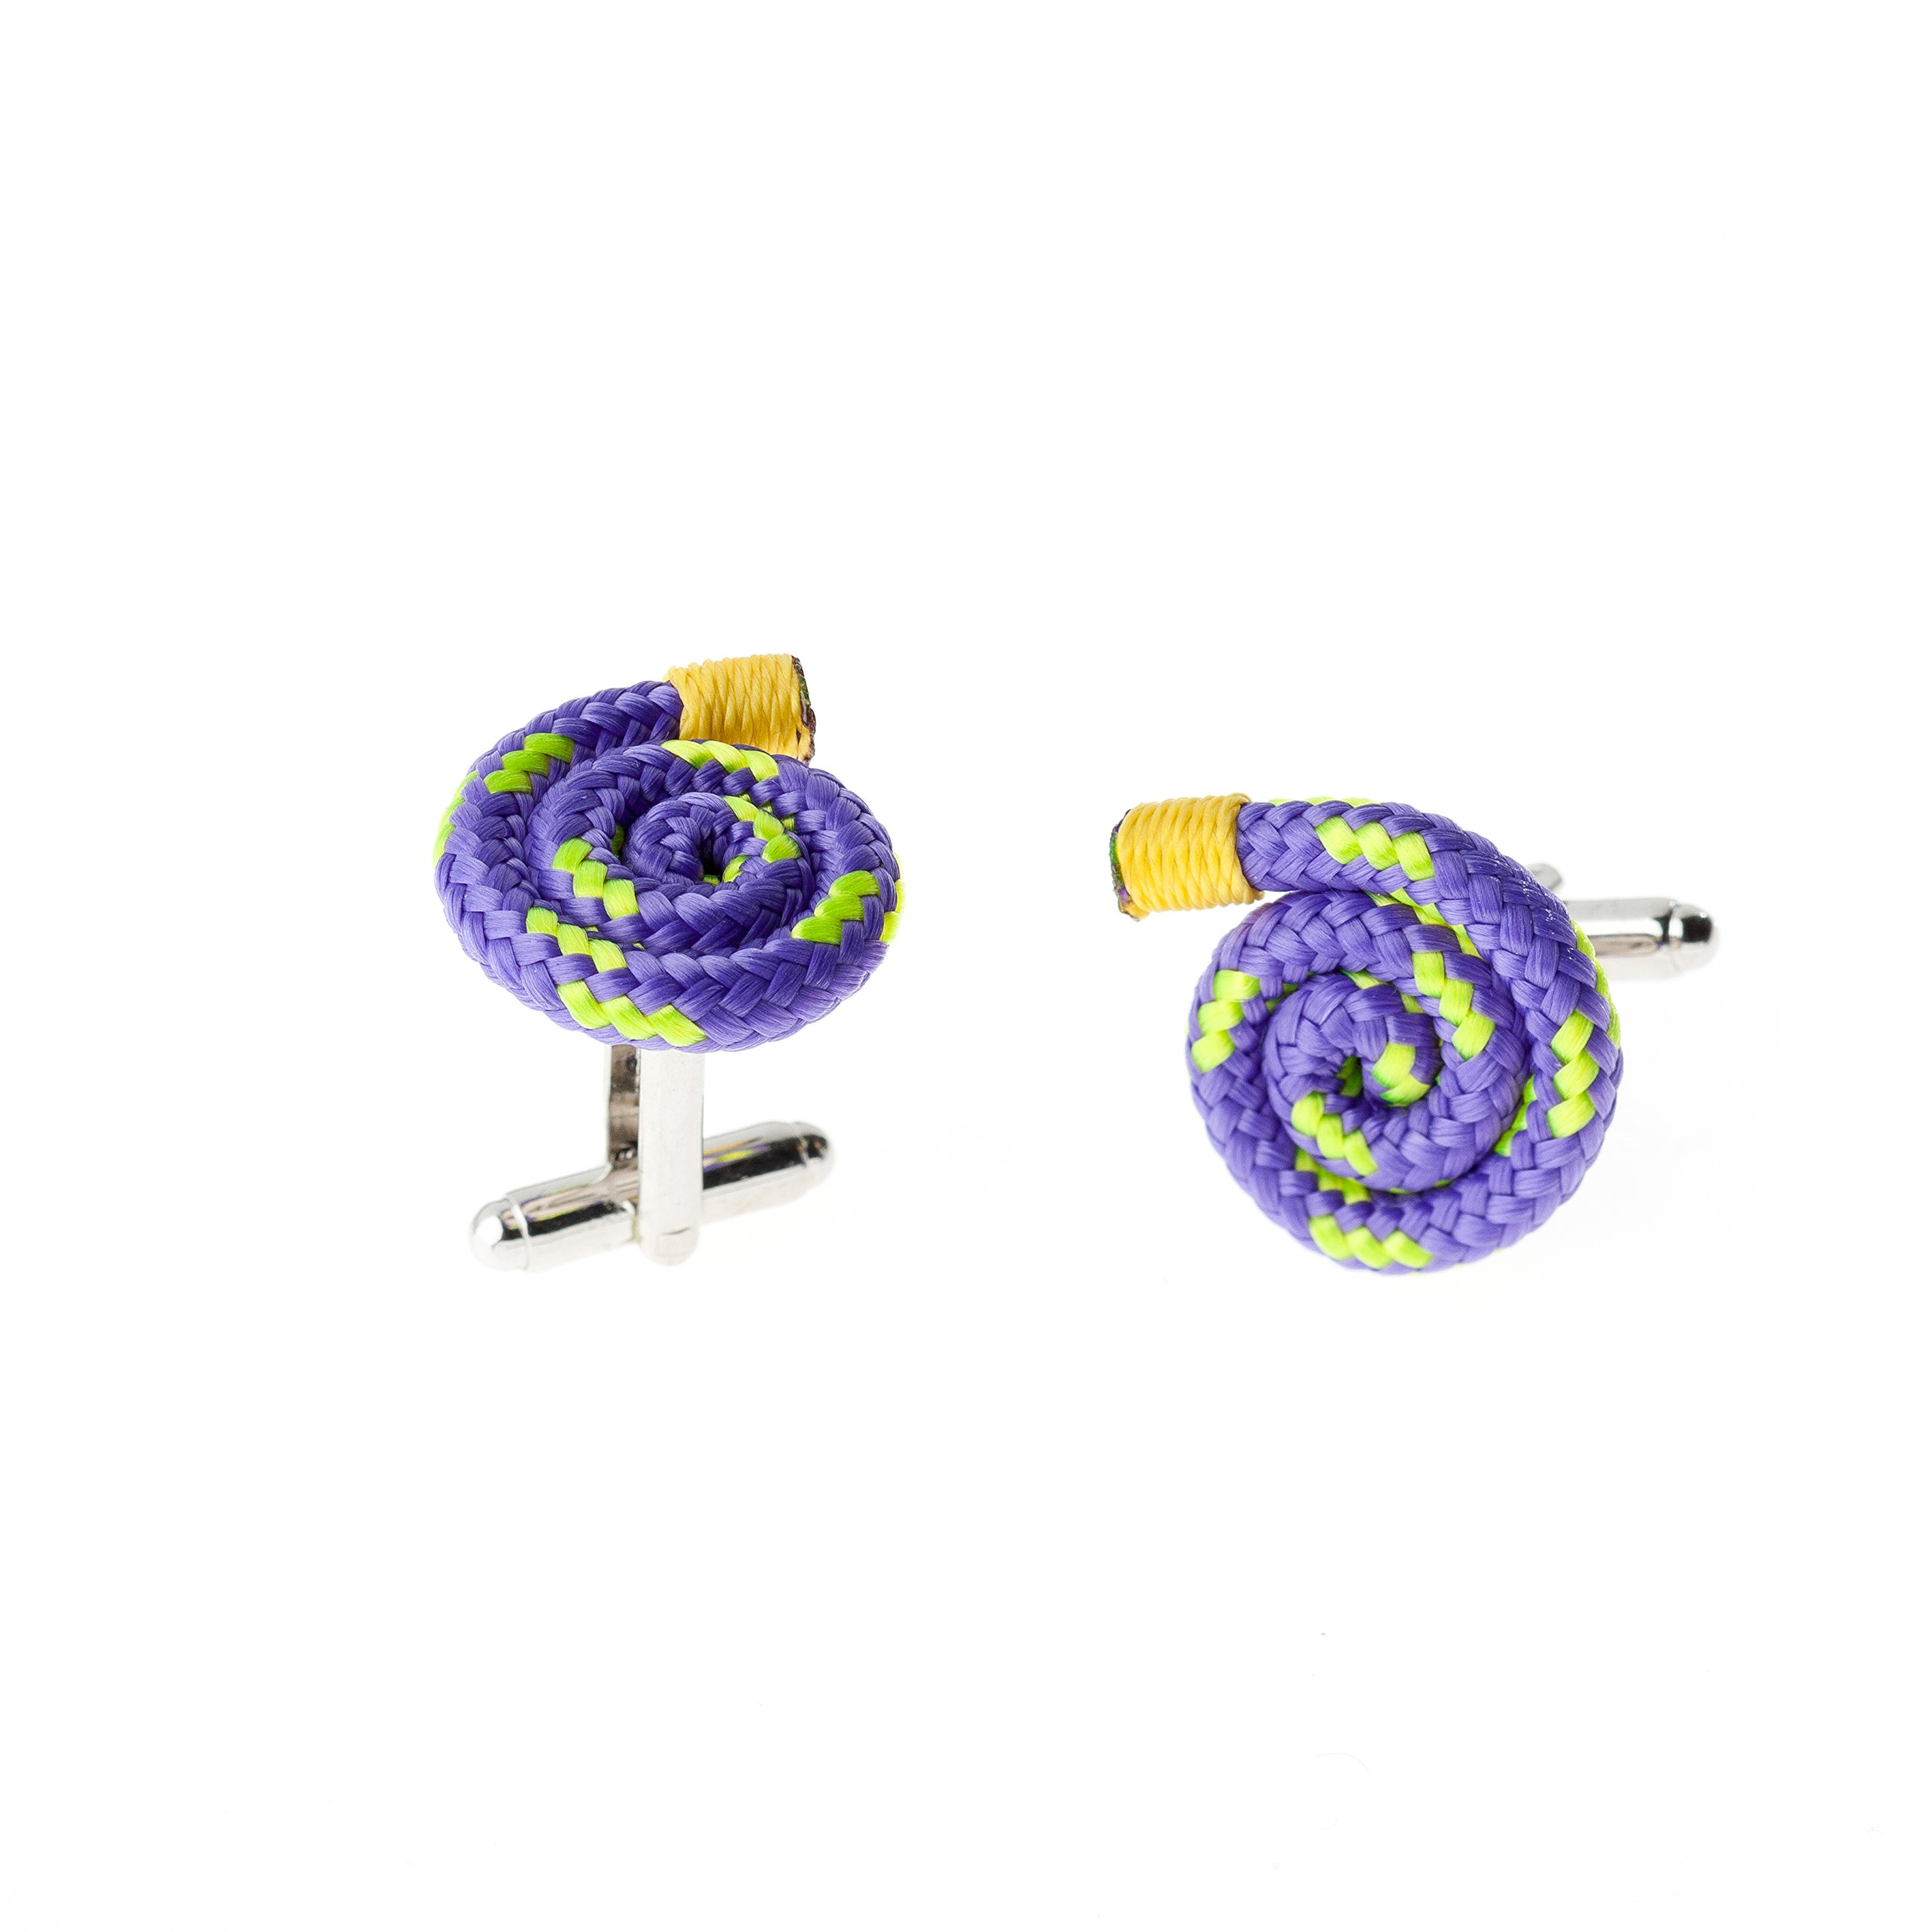 Purple Designer Unique Stylish Handmade Rope String Cufflinks for Men